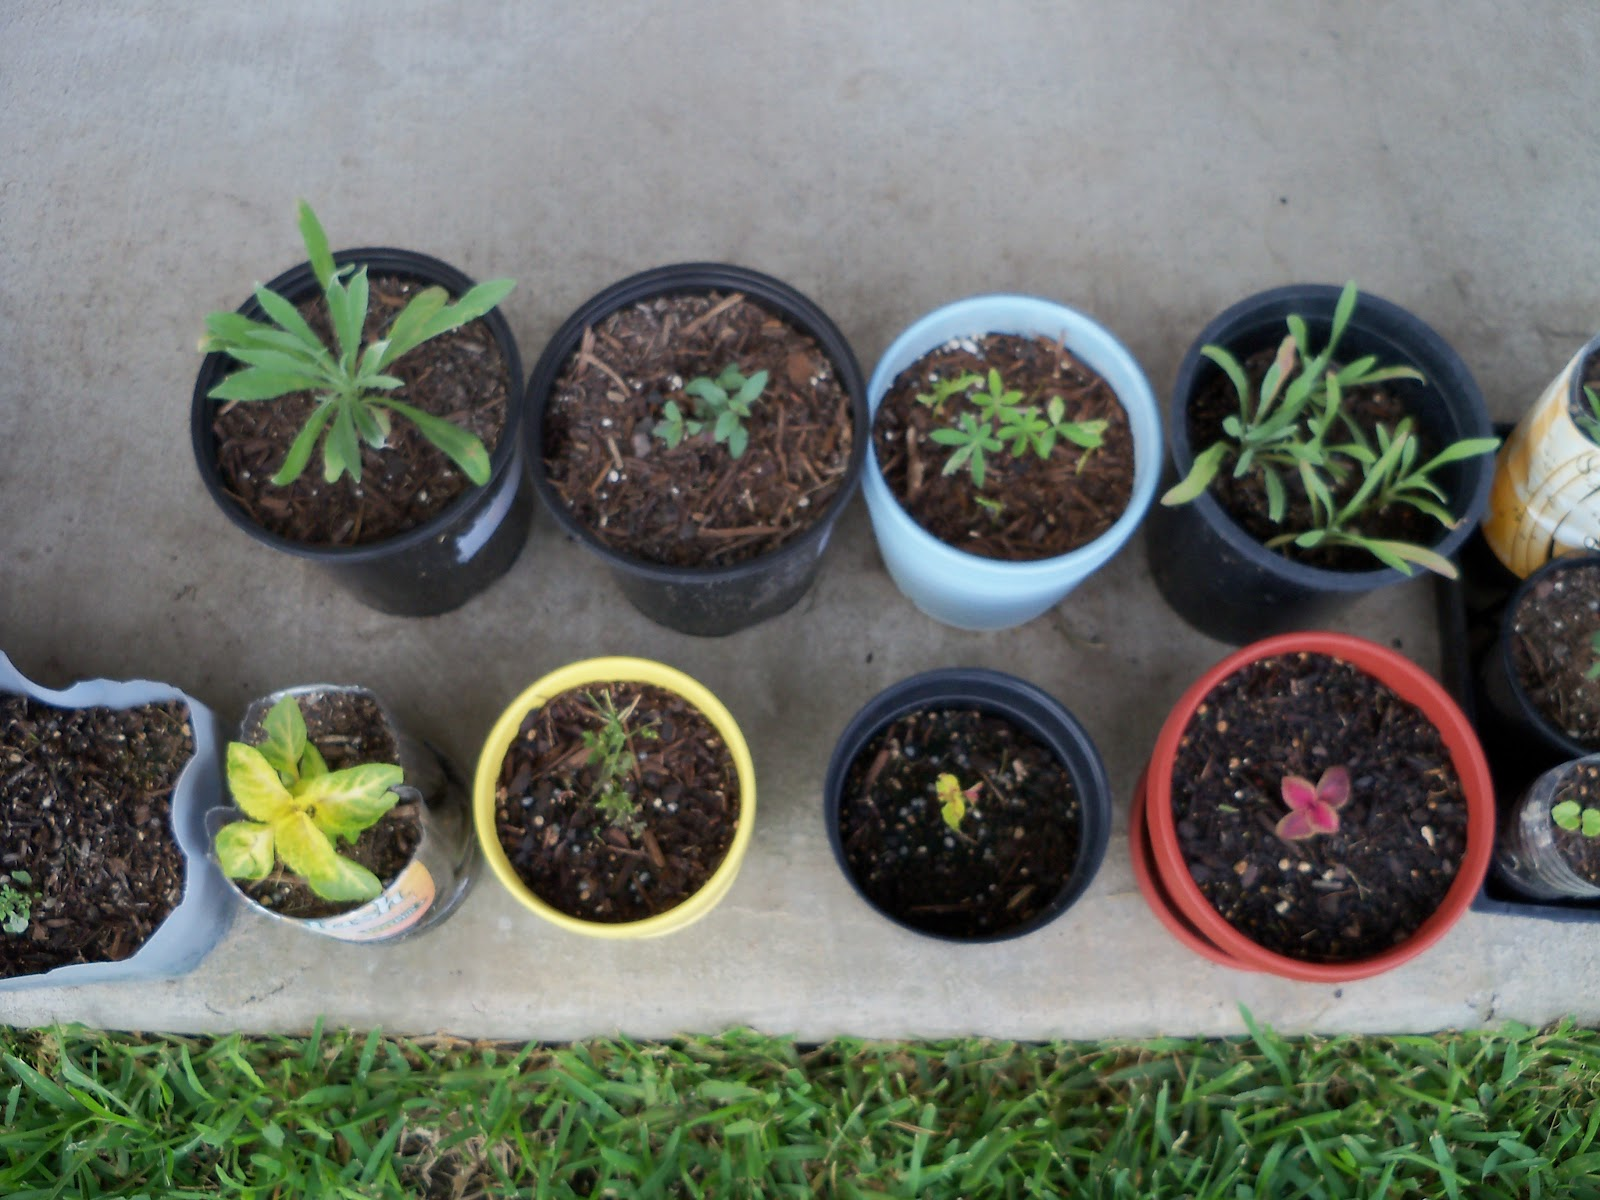 Gardening 2010, Part Two - 101_2800.JPG